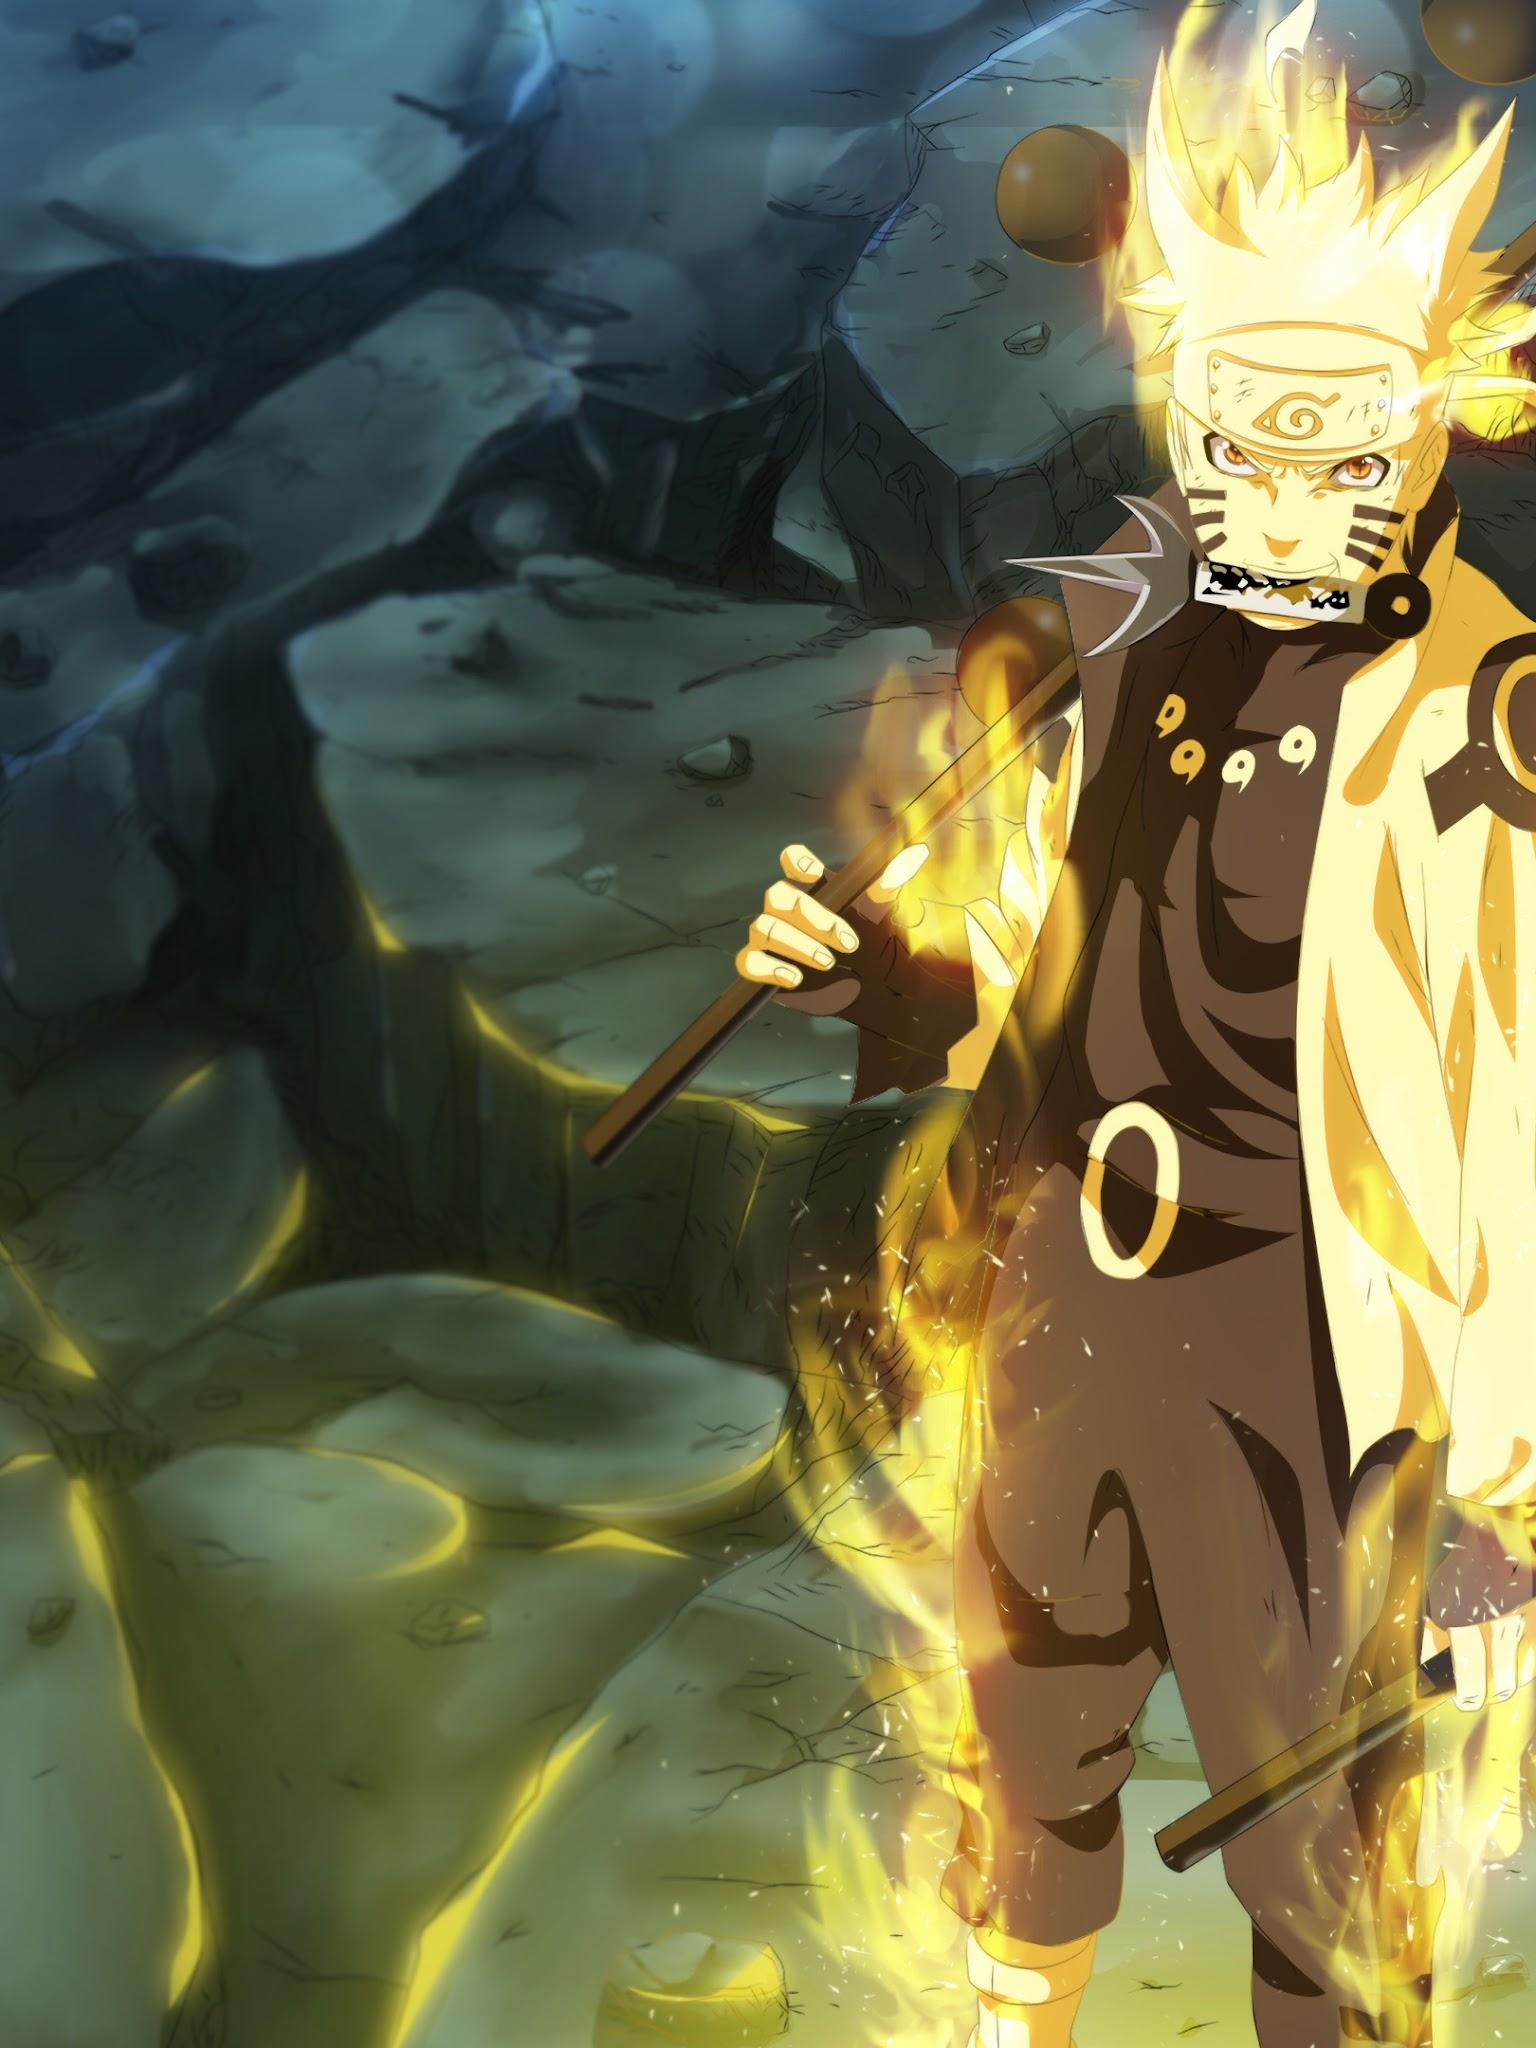 naruto sasuke uhdpaper.com 4K 56